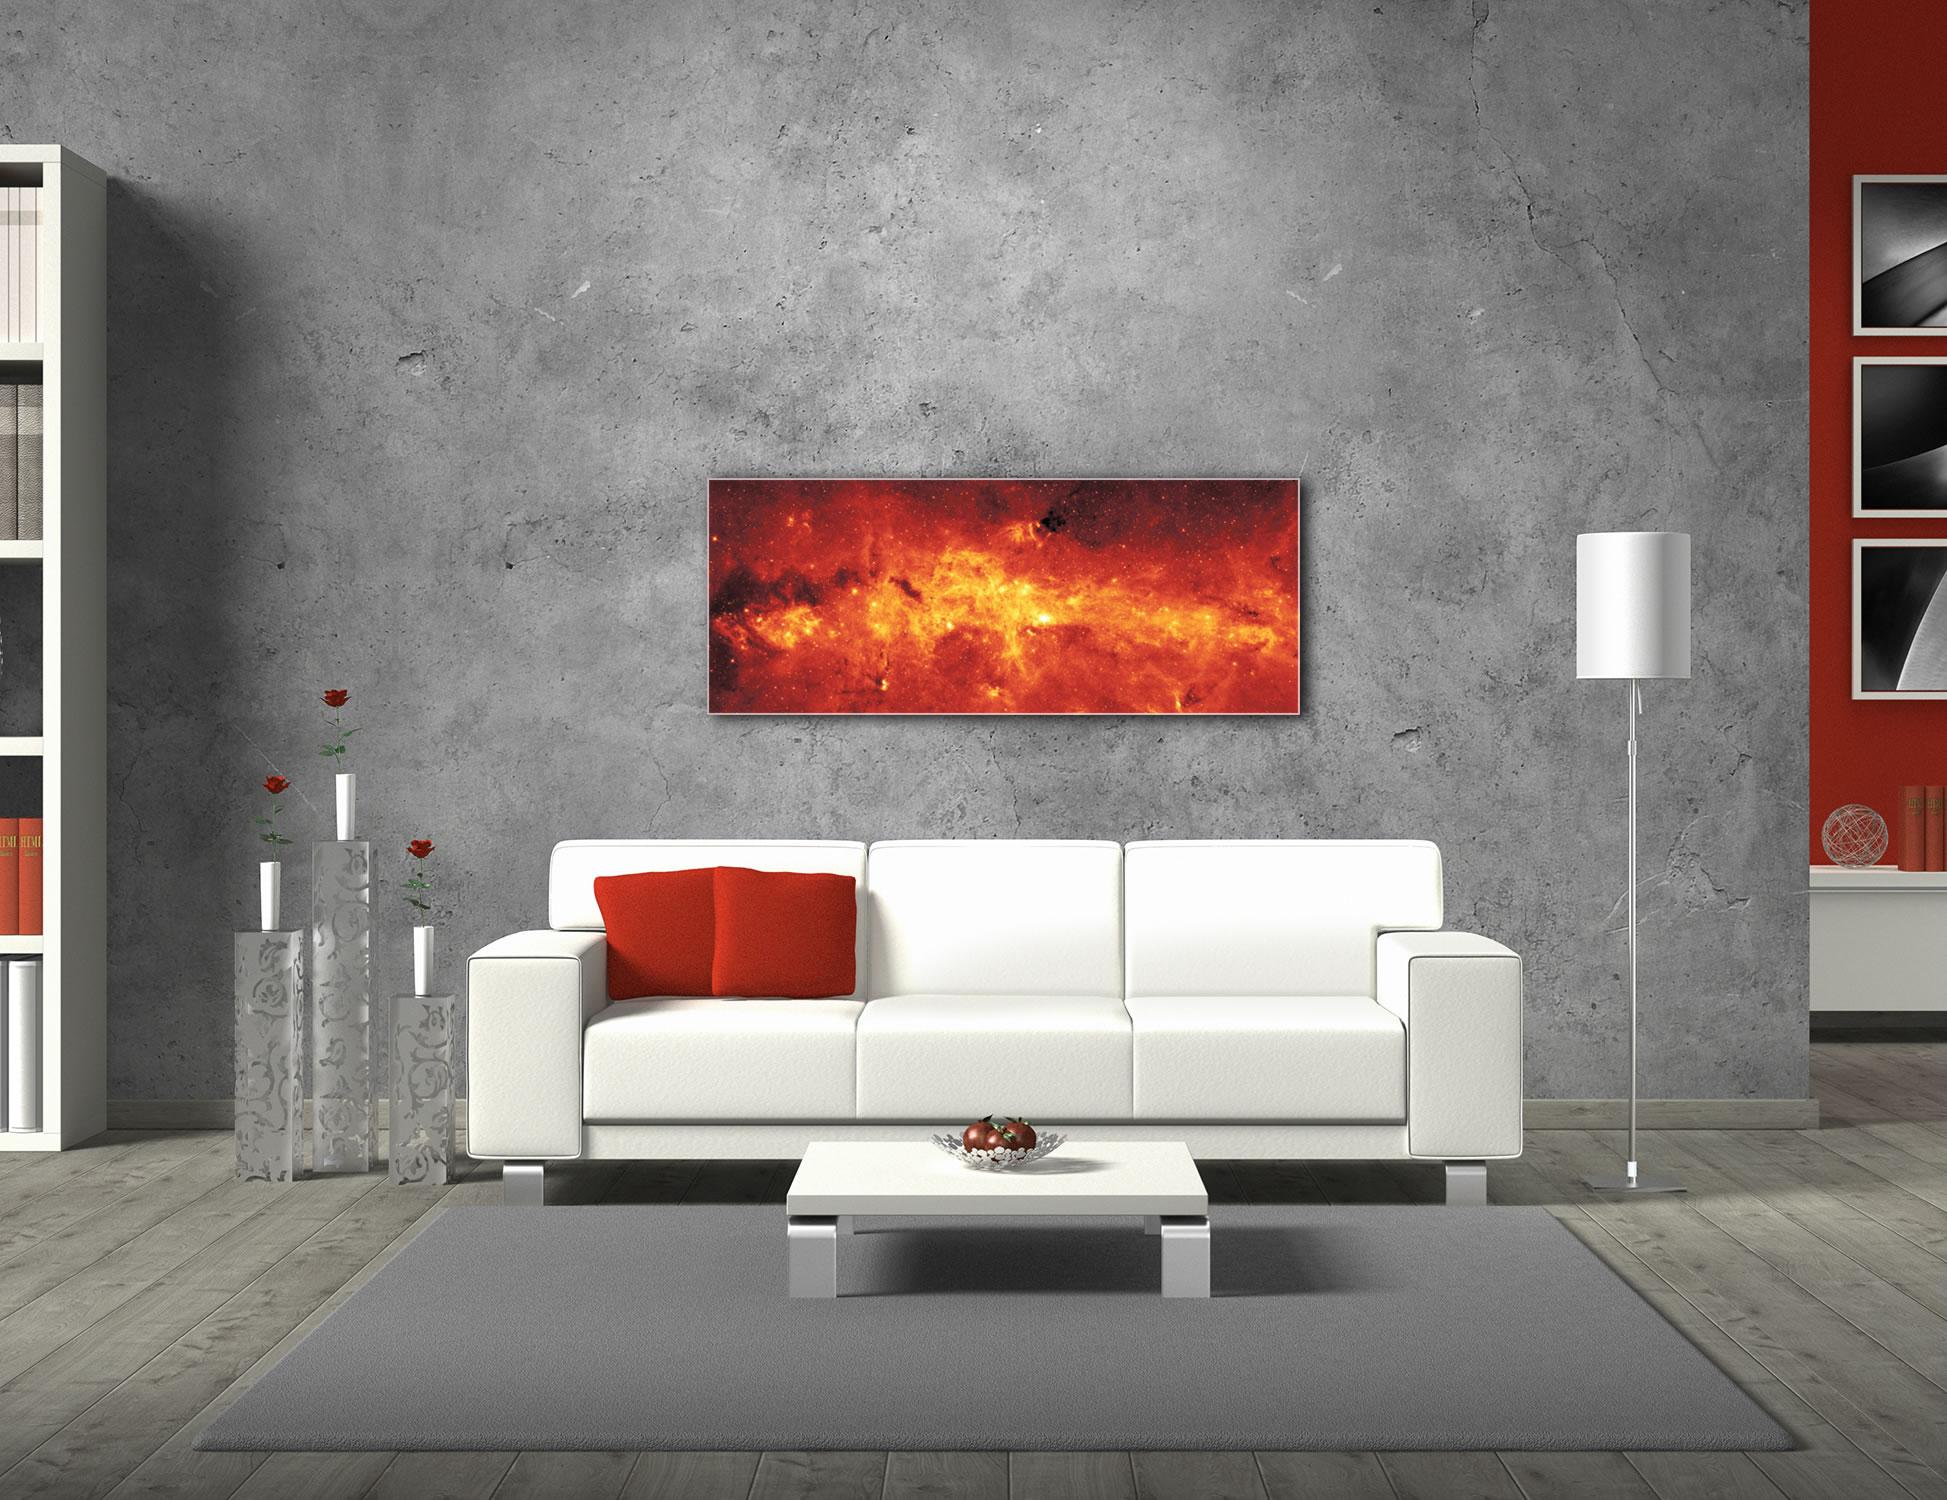 Galactic Center - Modern Wall Decor - Lifestyle Image